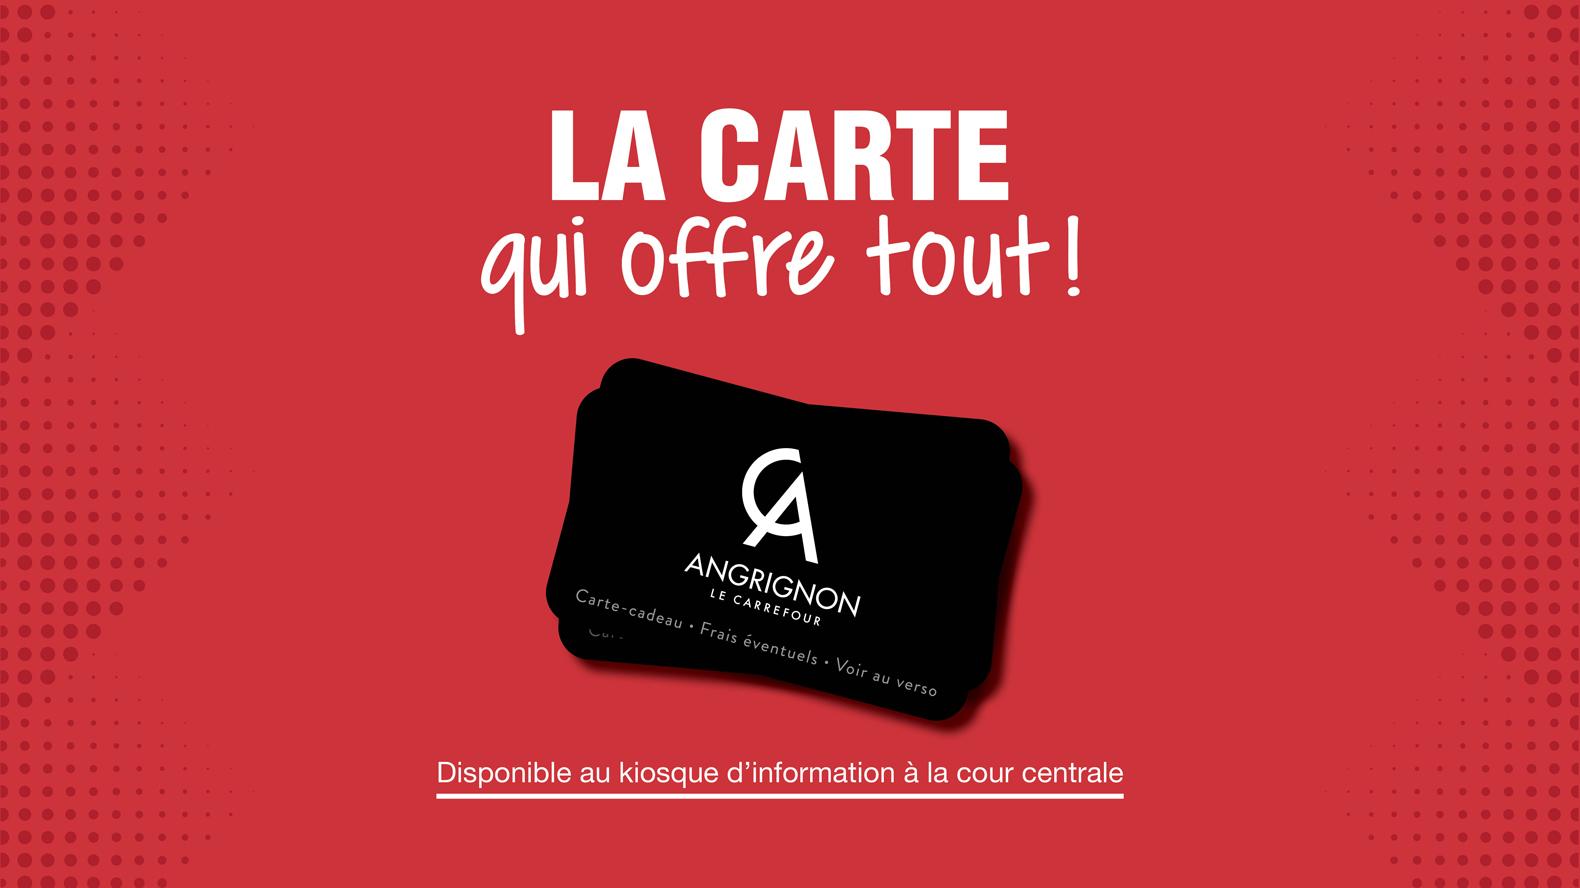 Carte Carrefour Angrignon.Www Carrefourangrignon Com App Uploads Sites 8 201